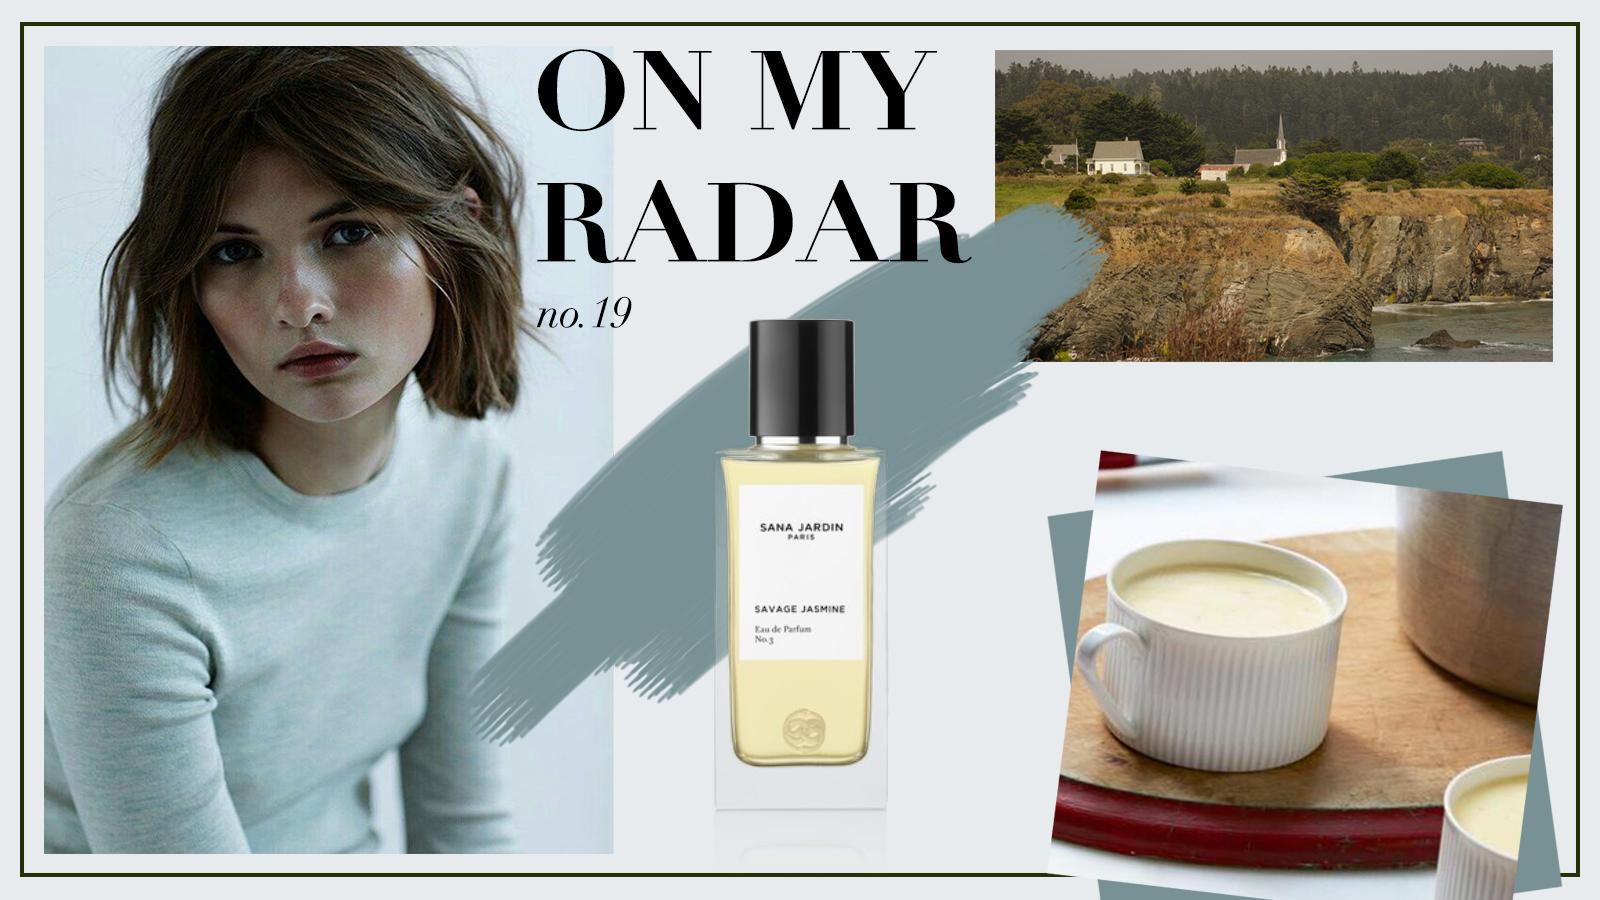 On_my_radar_waves_tutorial_spiked_hot_chocolate_banana_republic_holiday_sana-Jardin-perfume.jpg